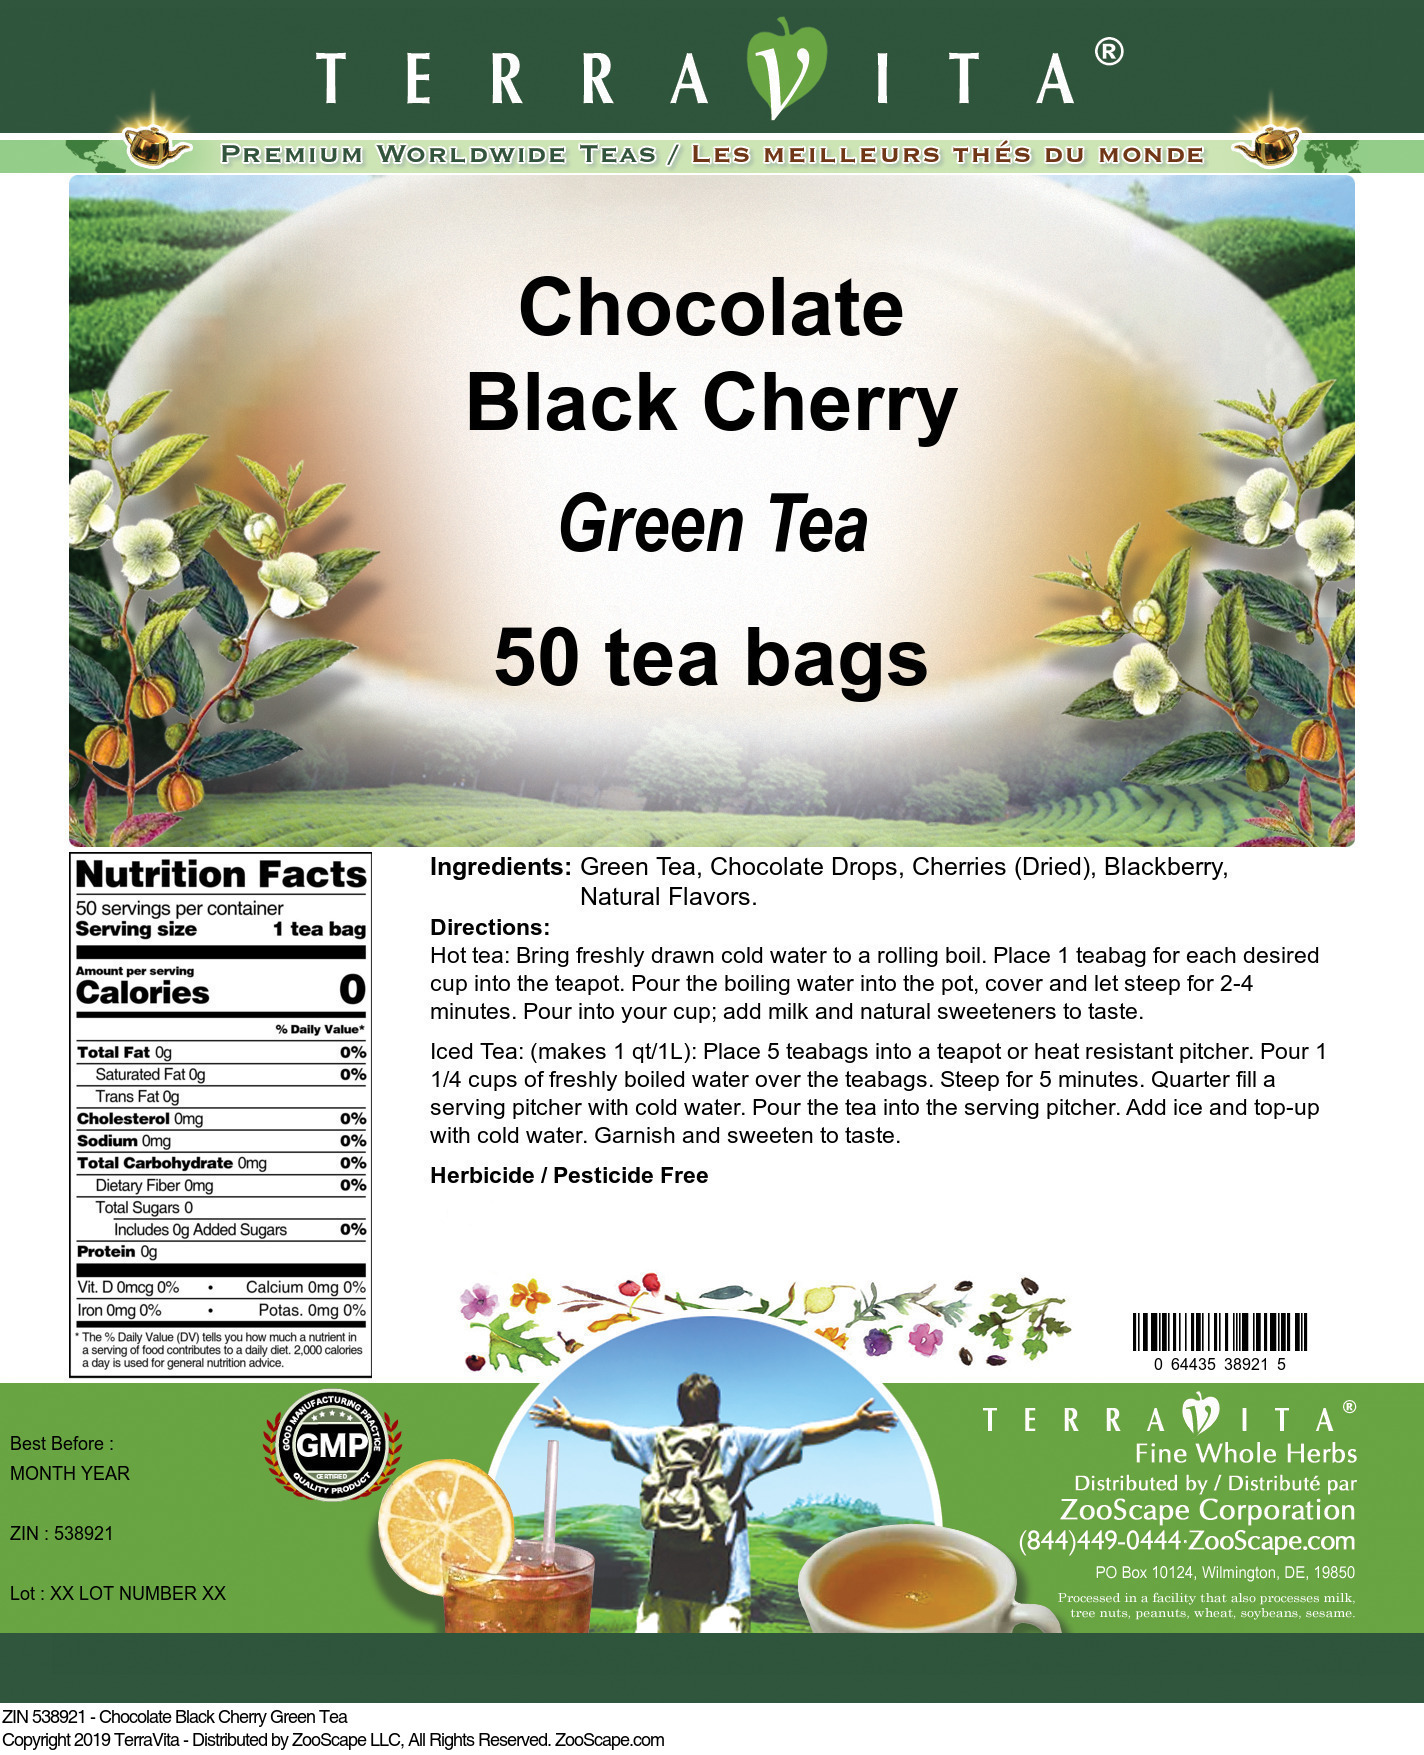 Chocolate Black Cherry Green Tea